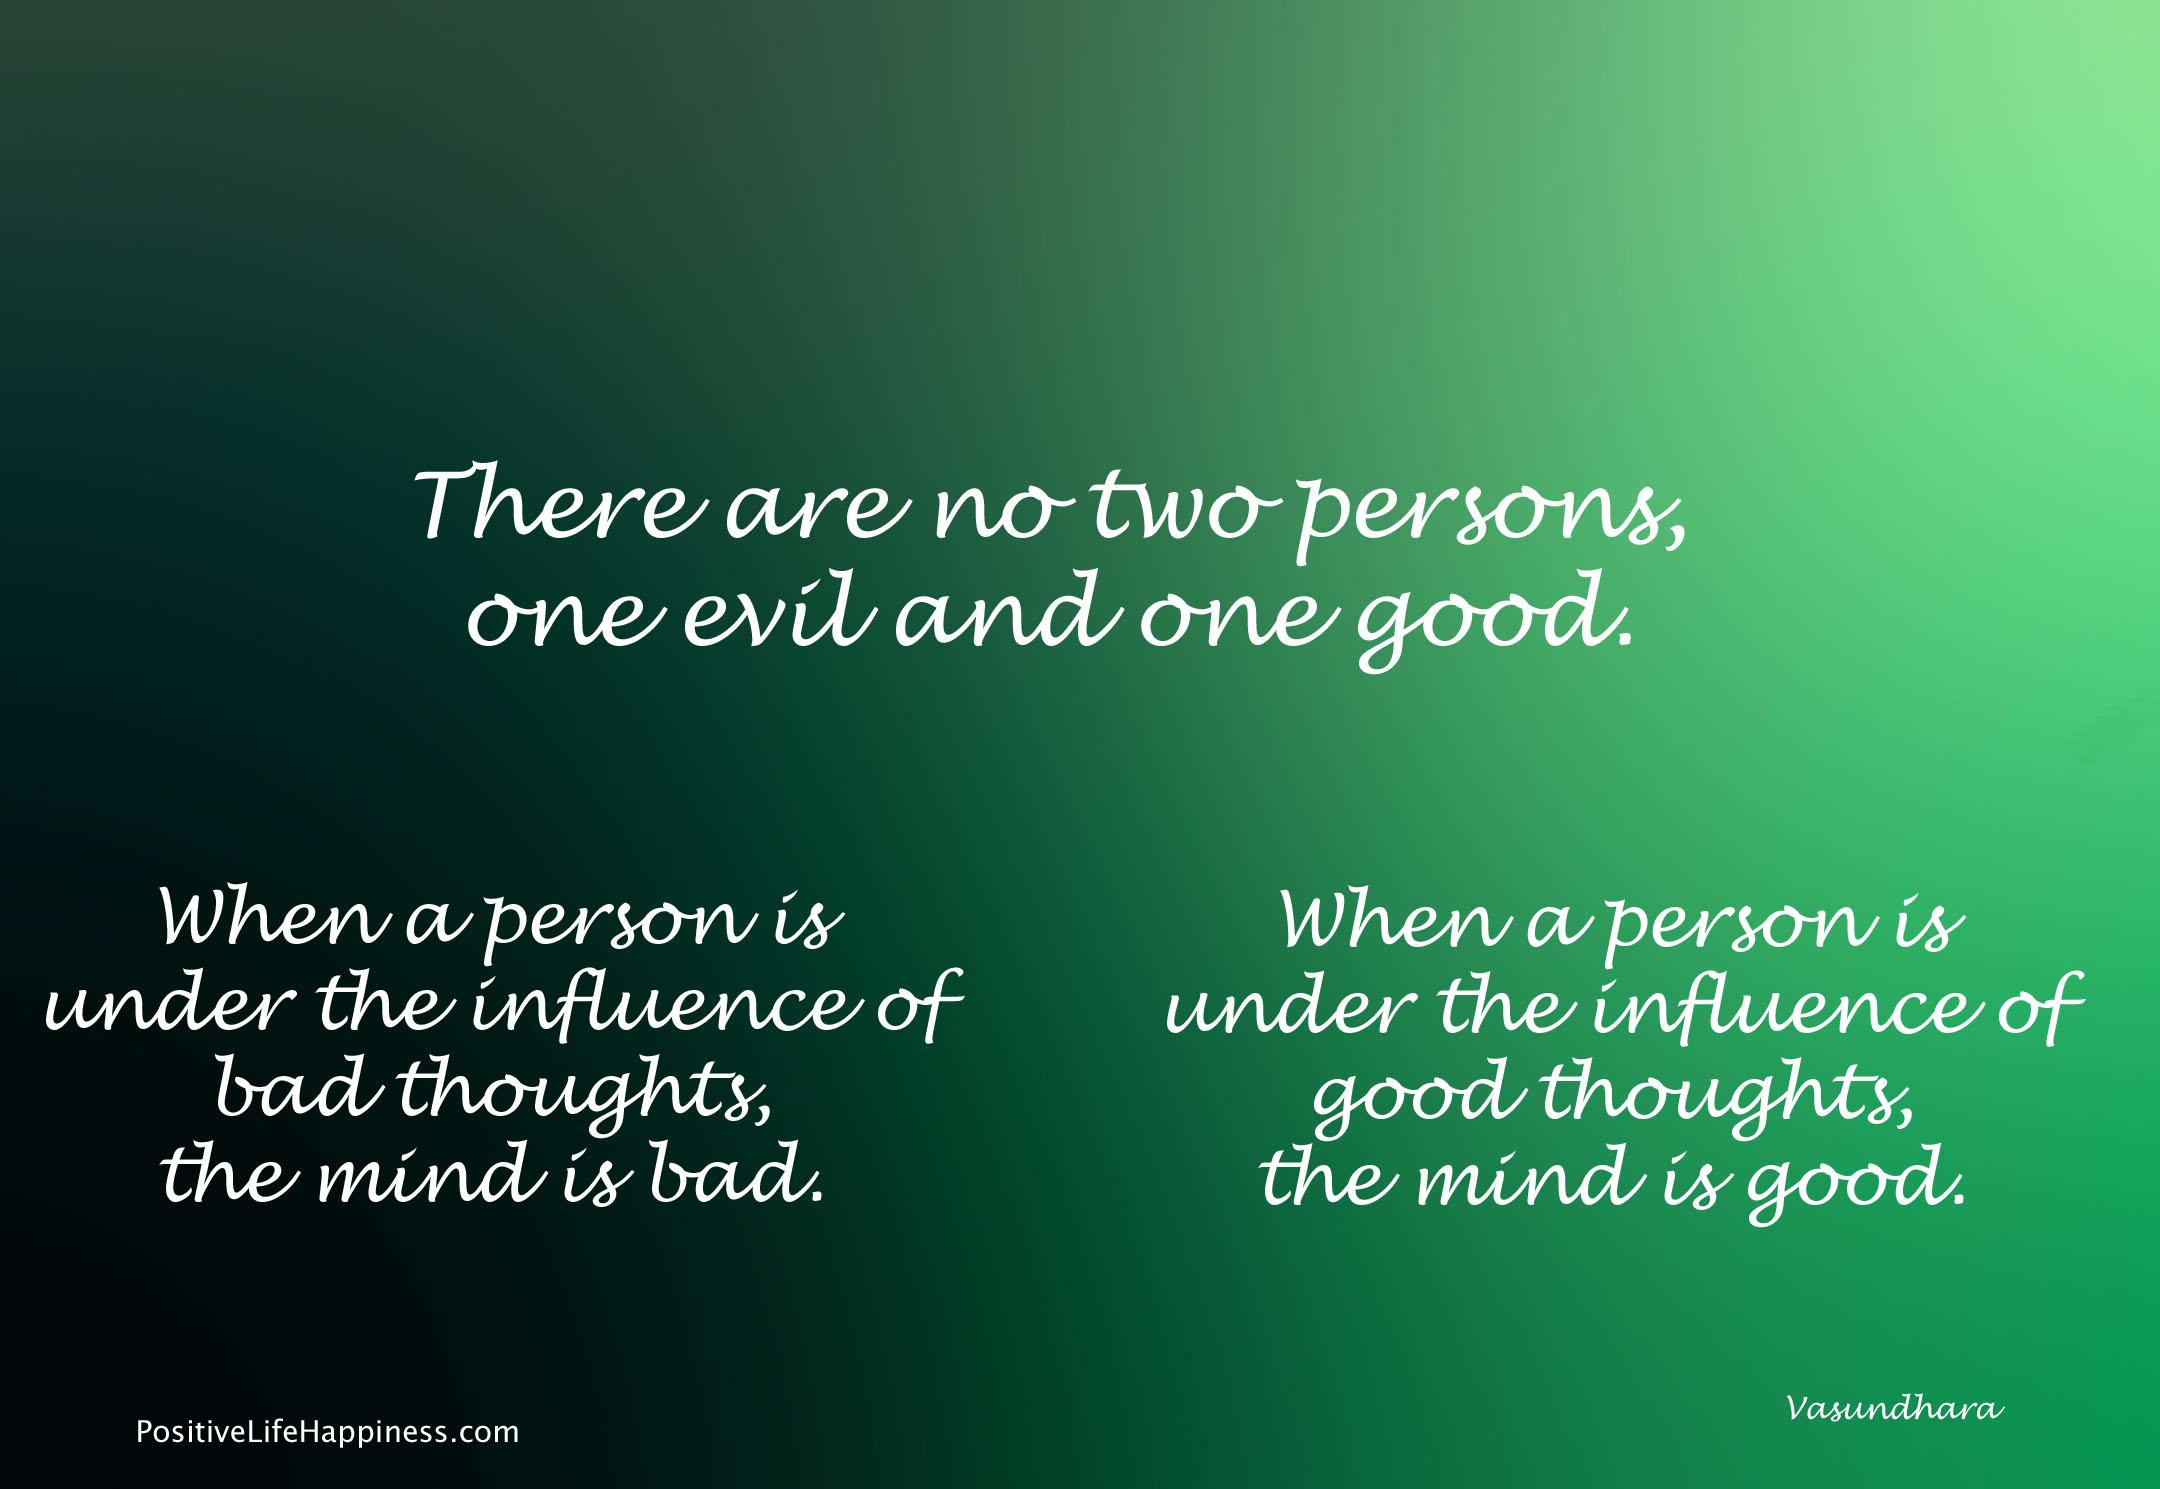 Good or bad mind